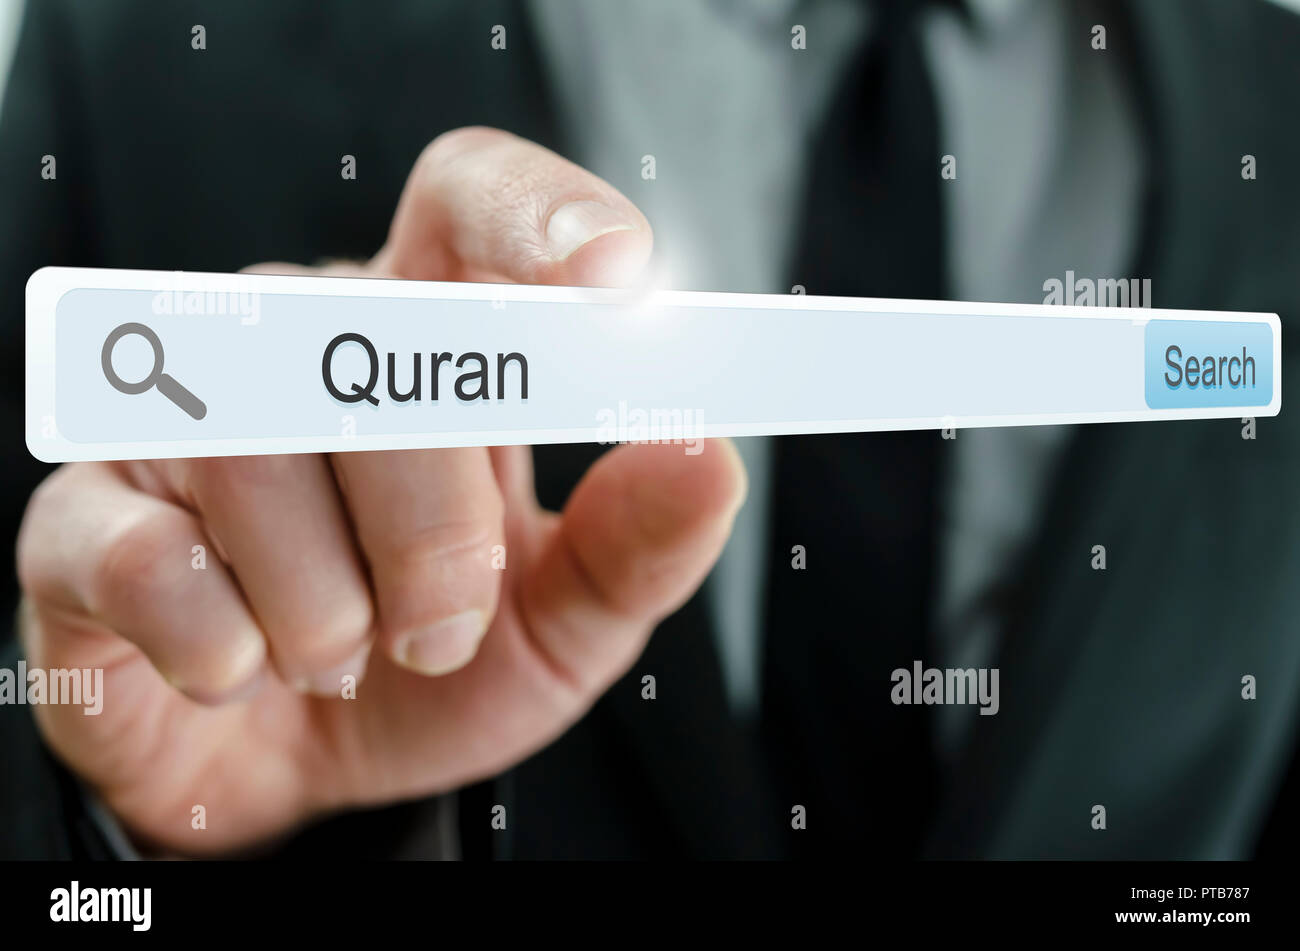 Word Quran written in search bar on virtual screen Stock Photo